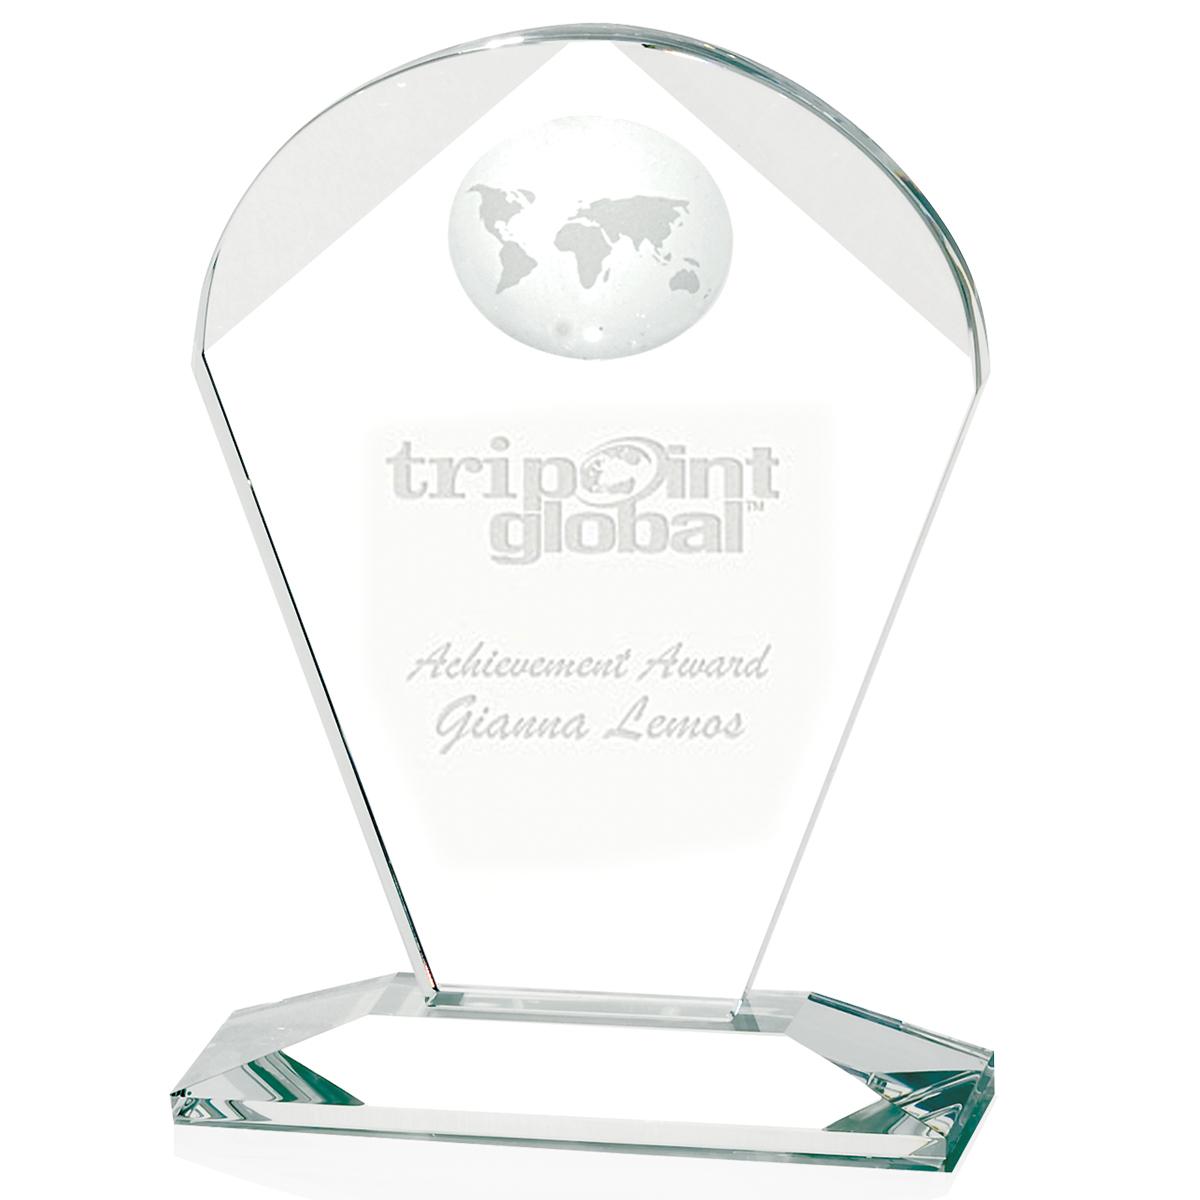 Jaffa Geodesic Small Award - Deep Etch Imprint, #35070